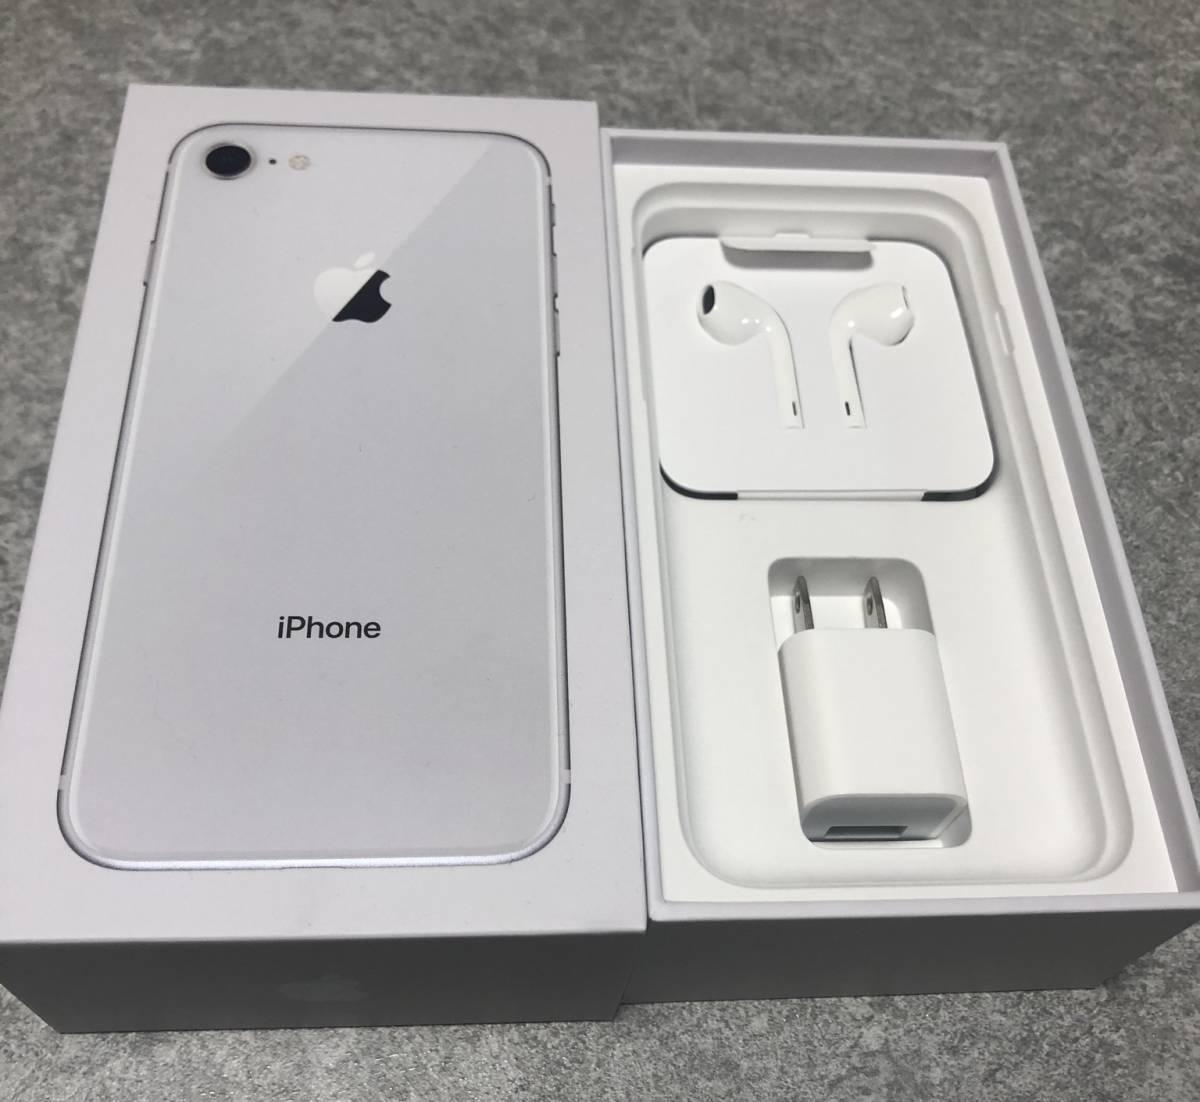 【SIMロック解除済(SIMフリー)】Softbank iPhone8 64GB シルバー 未使用品 判定○ 残債なし_画像2